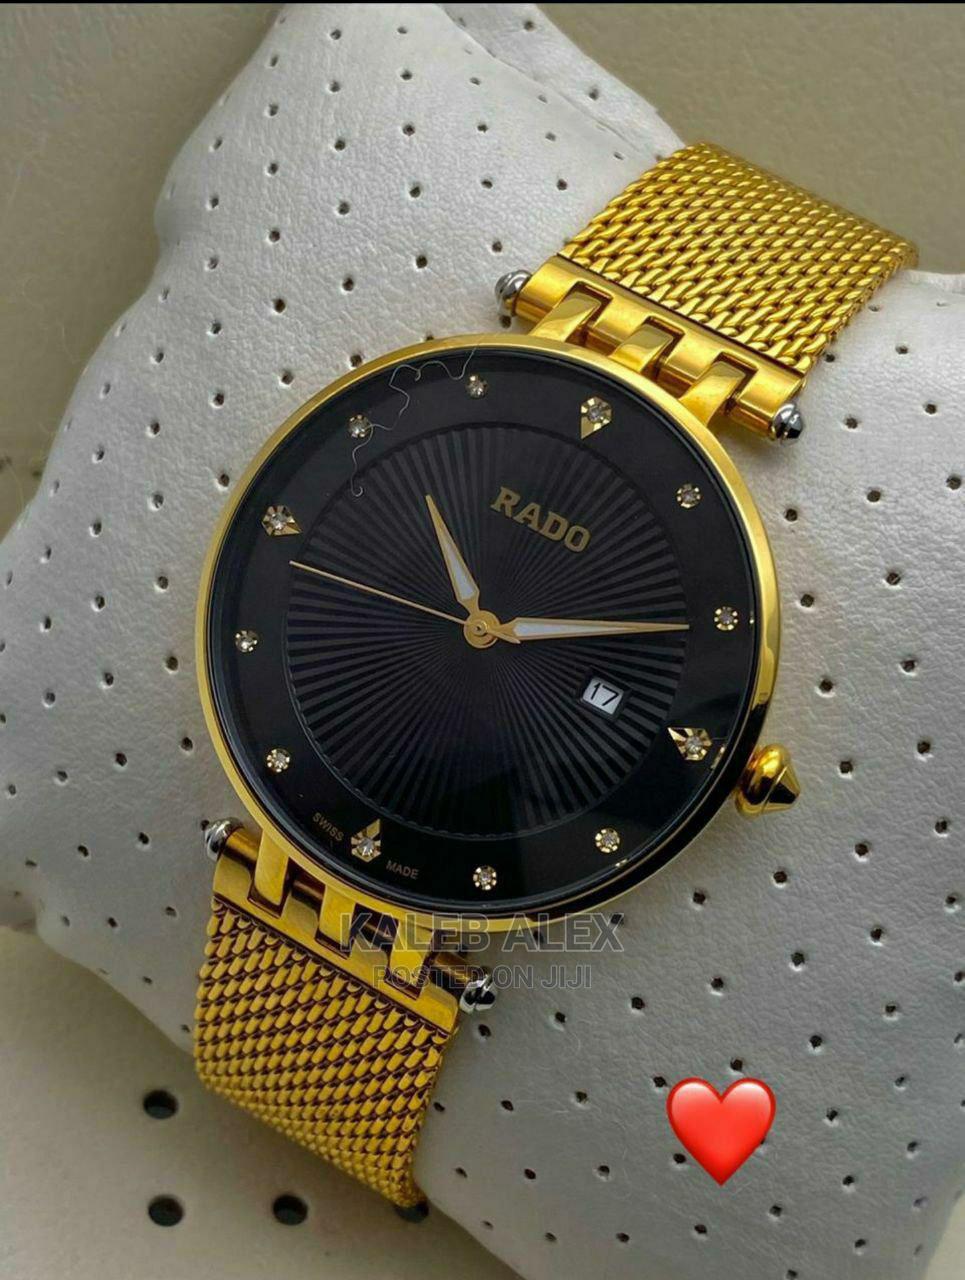 Richard Mille -rado -audemars Piguet -emporio Armani | Watches for sale in Bole, Addis Ababa, Ethiopia